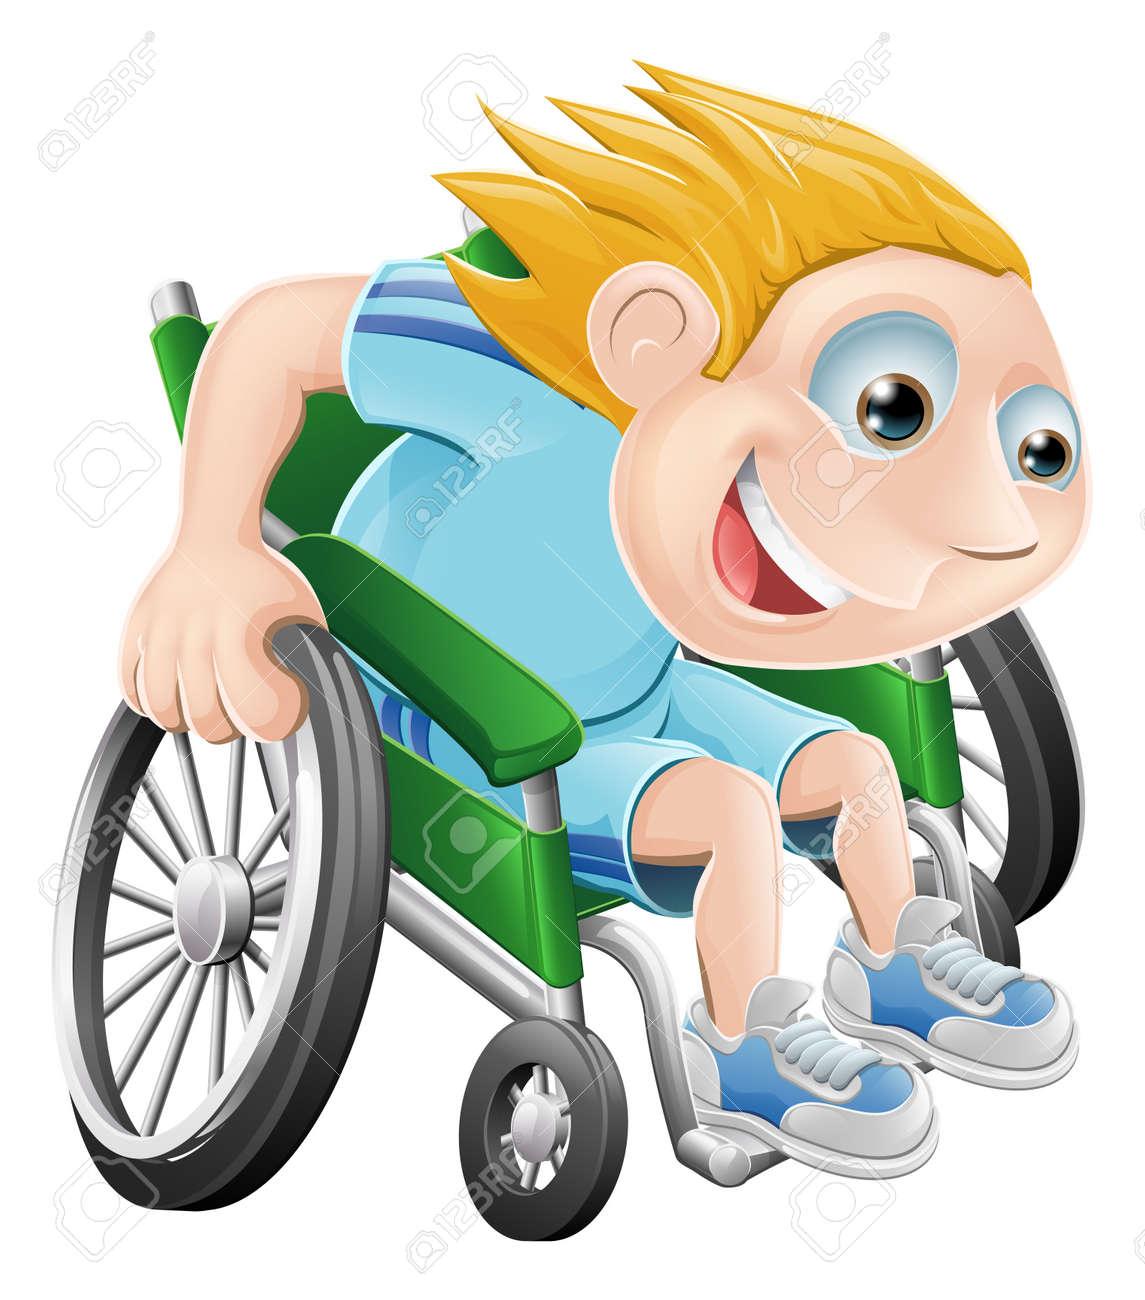 Cartoon illustration of a happy boy racing in his wheelchair Stock Vector - 12985683